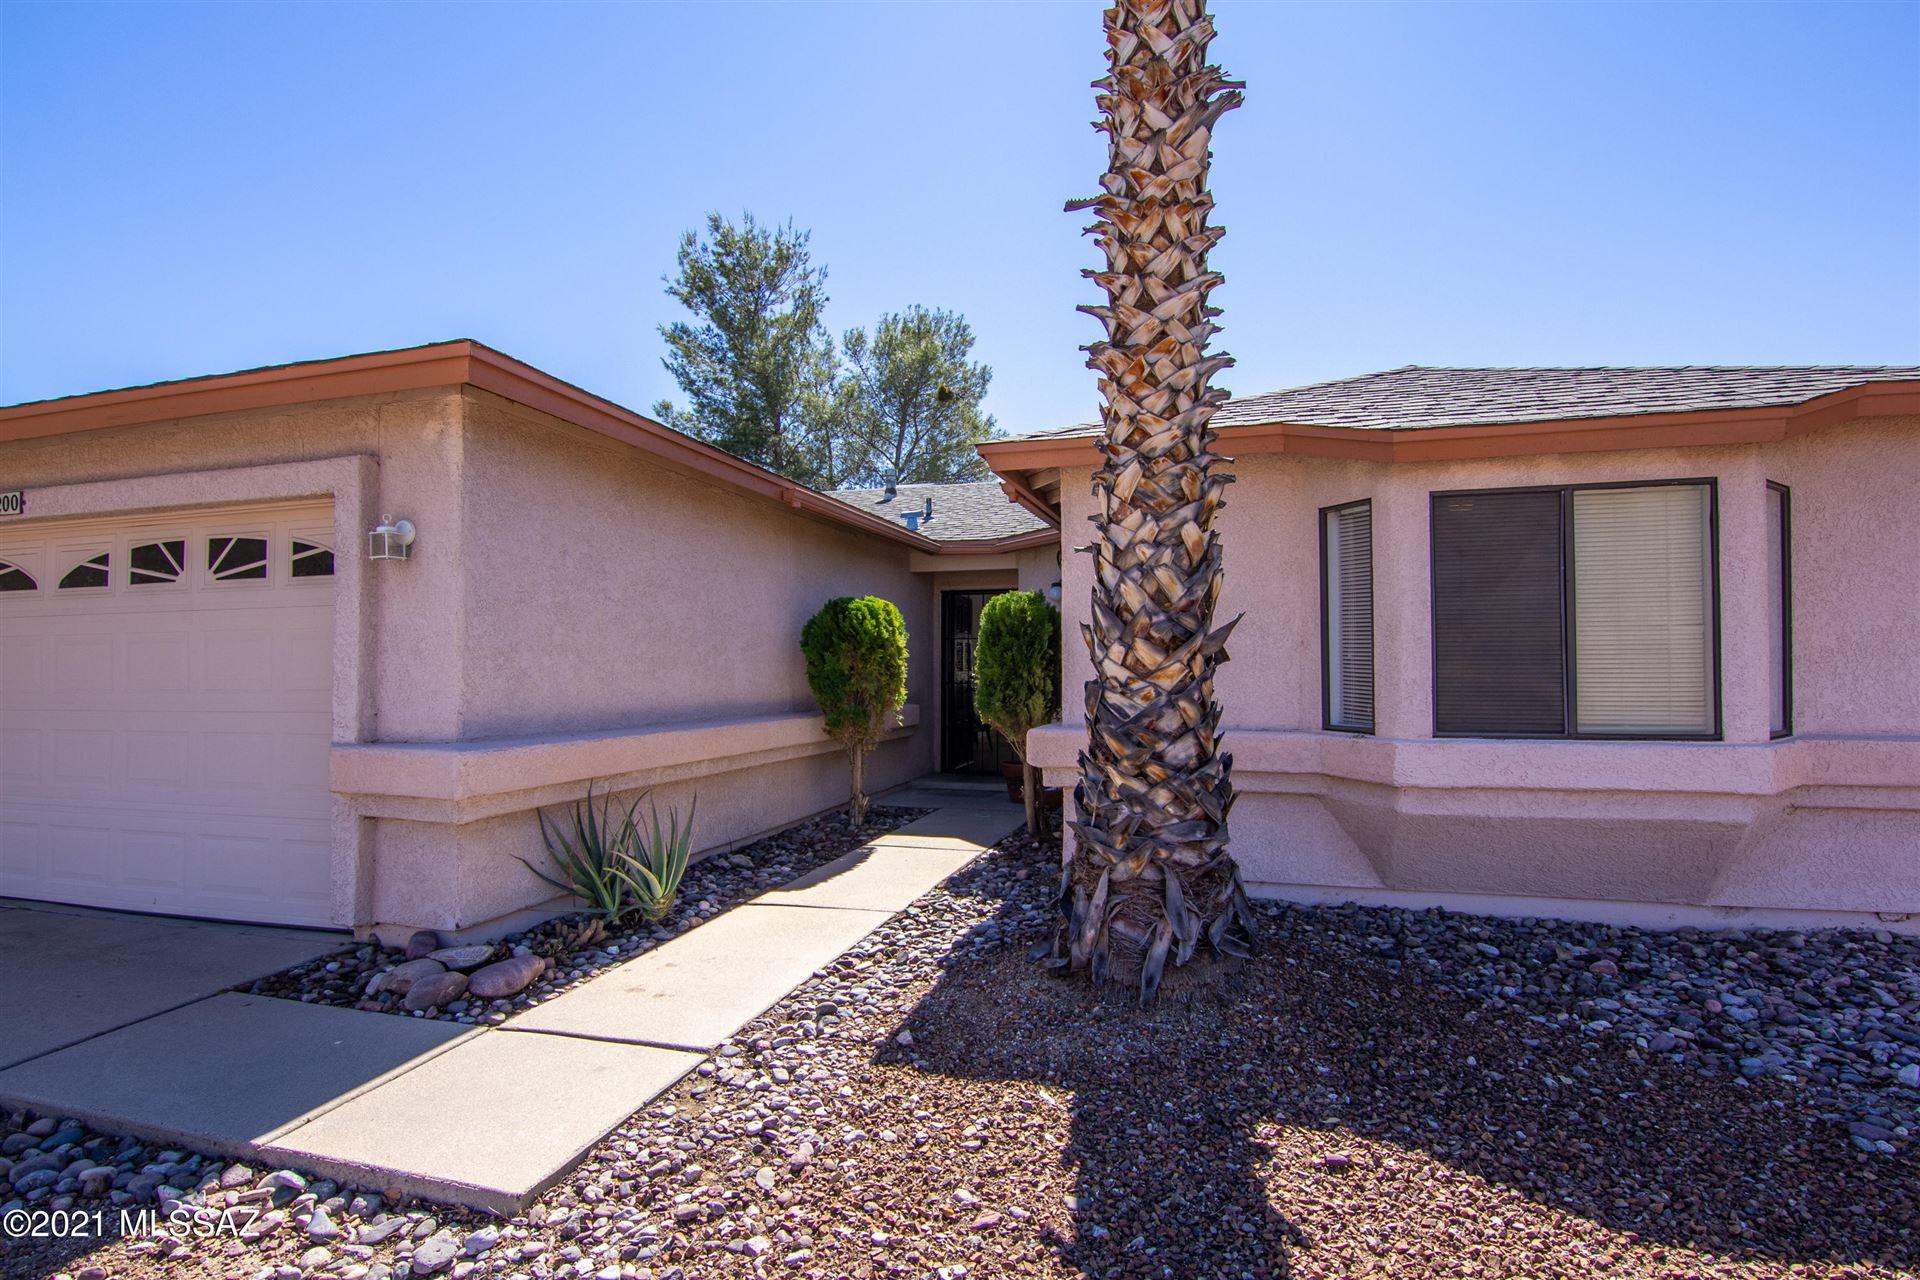 10200 E Calle Magdalena, Tucson, AZ 85748 - MLS#: 22105004